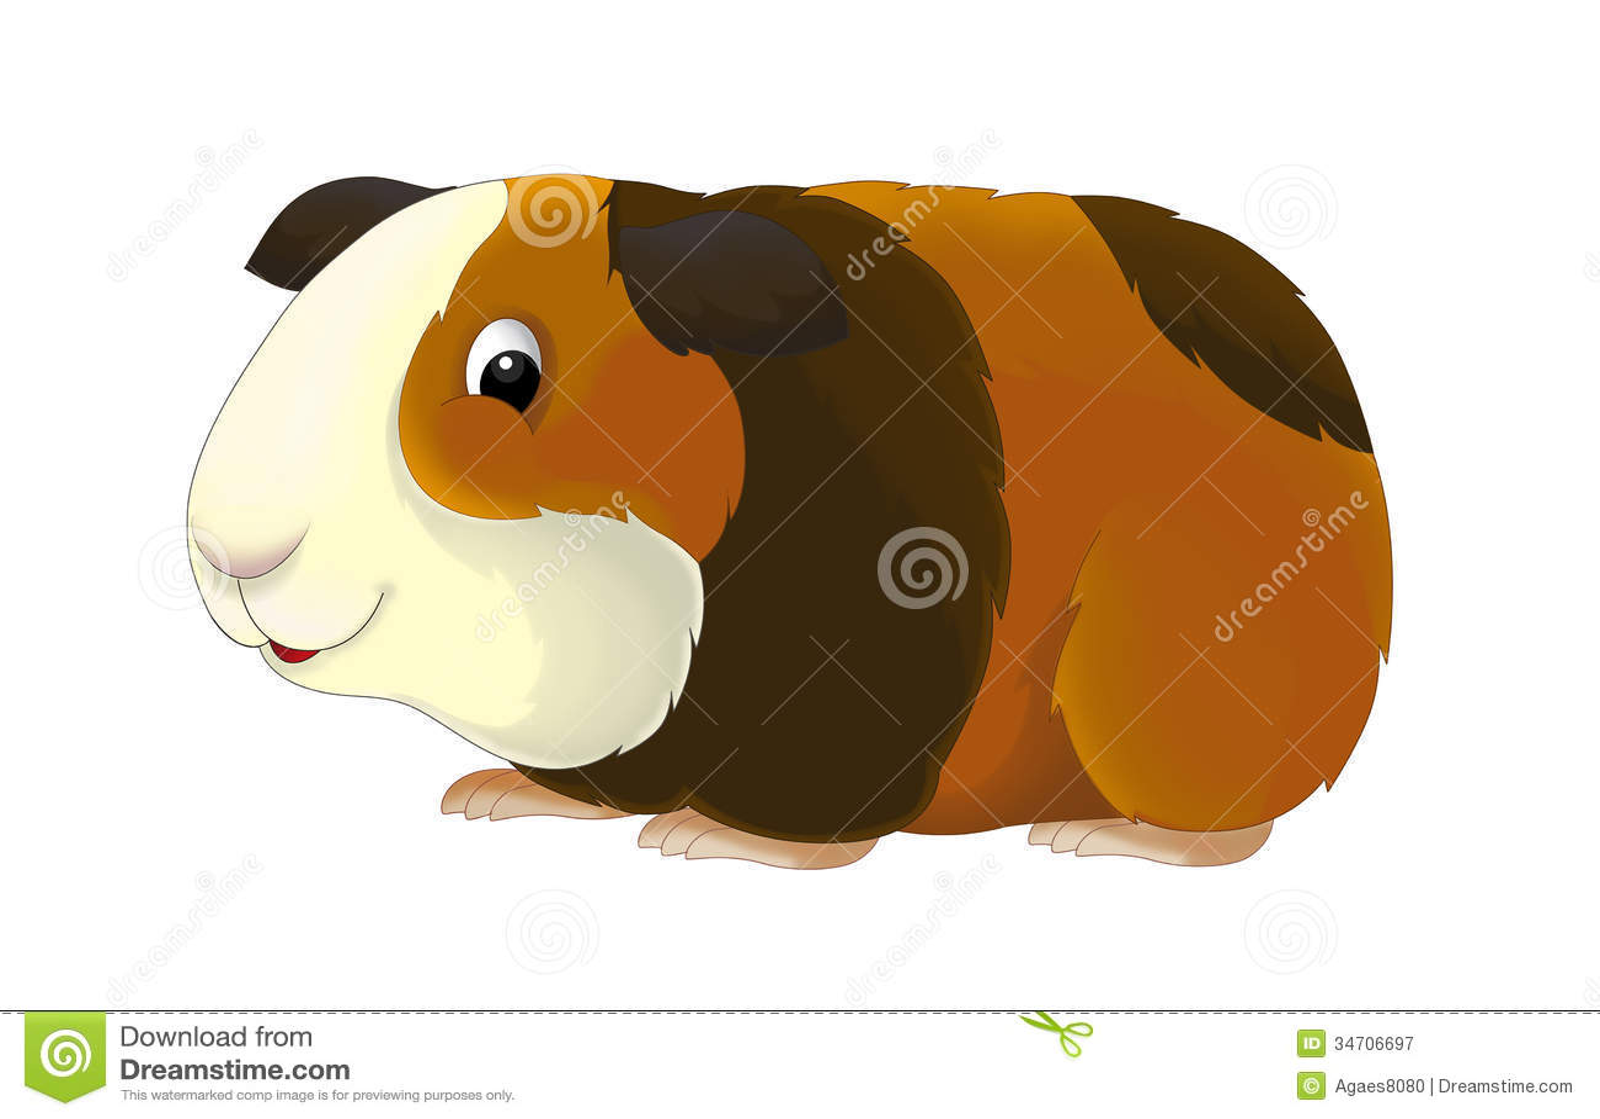 The Cartoon Guinea Pig Illustration For Children Royalty Free